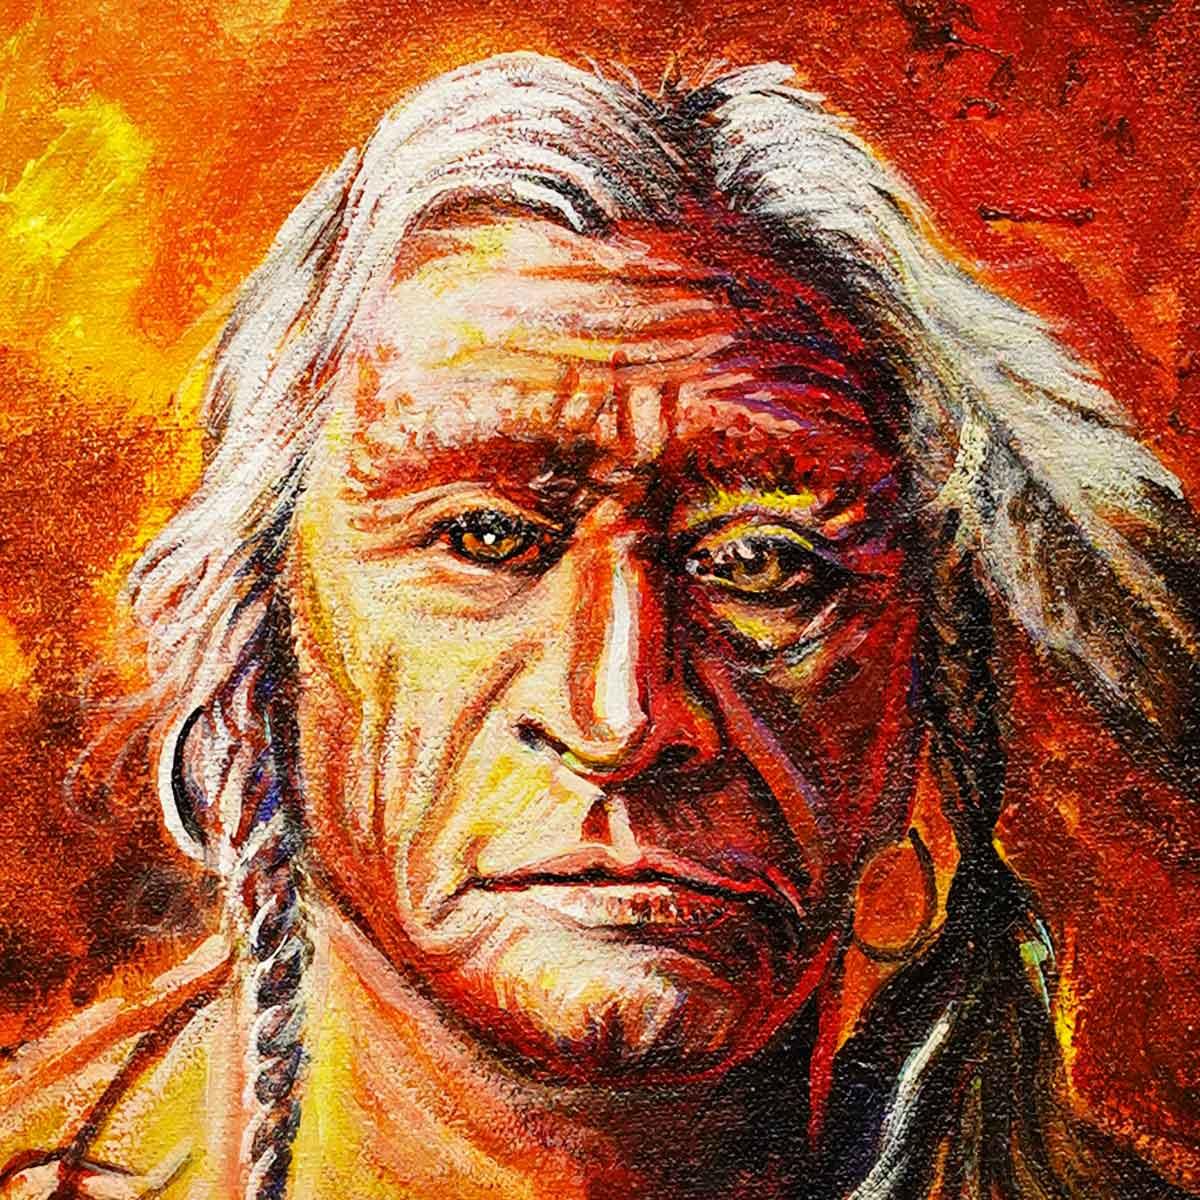 Chief of Wisdom